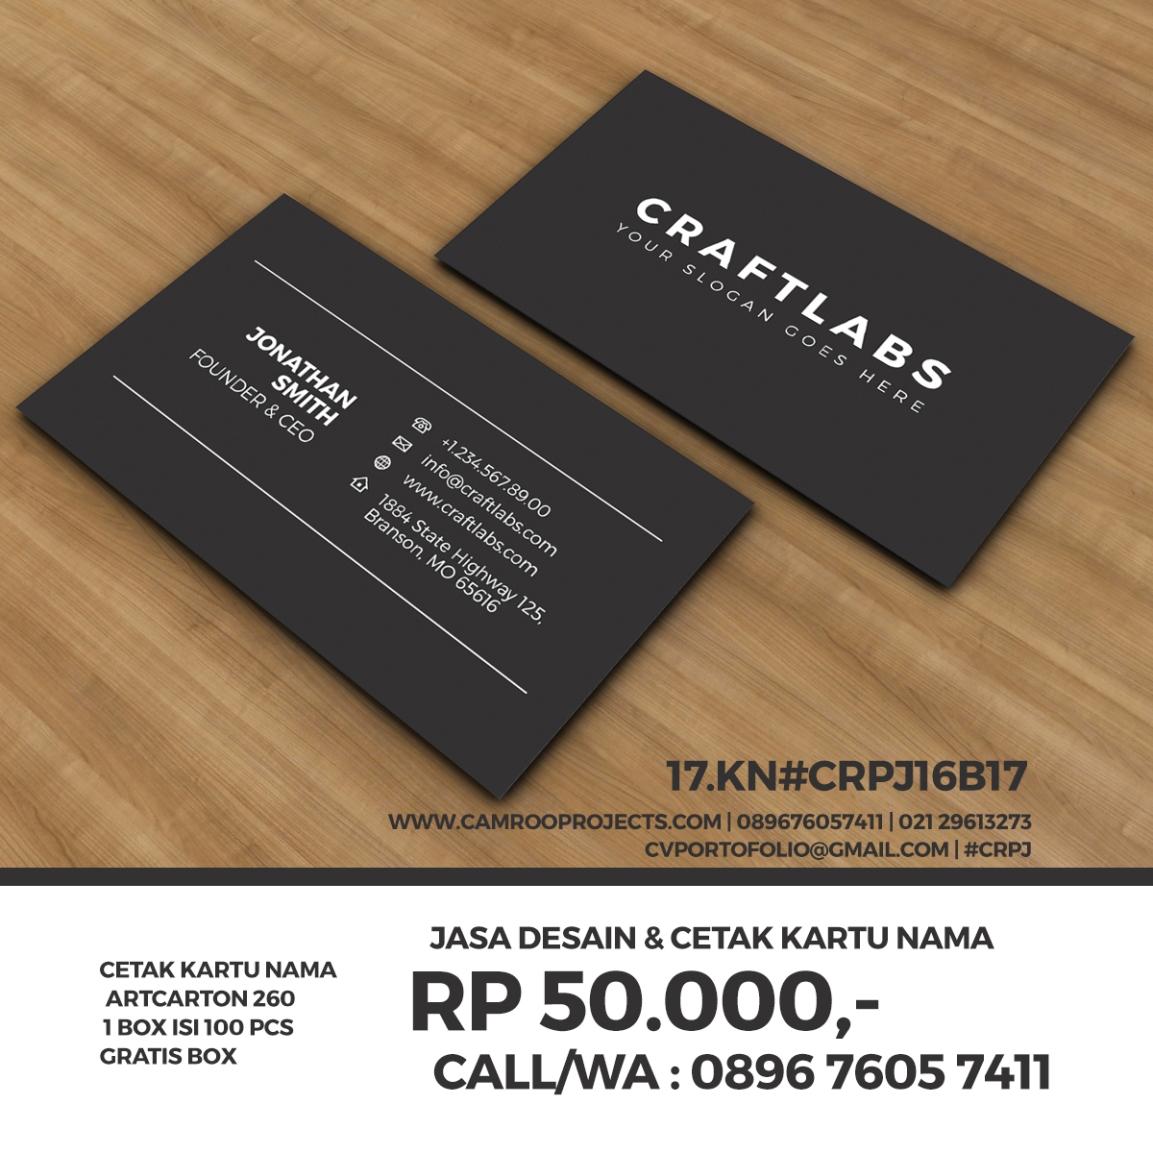 Jasa Desain Kartu Nama | kreatif | Call/WA 0896 760 574 11